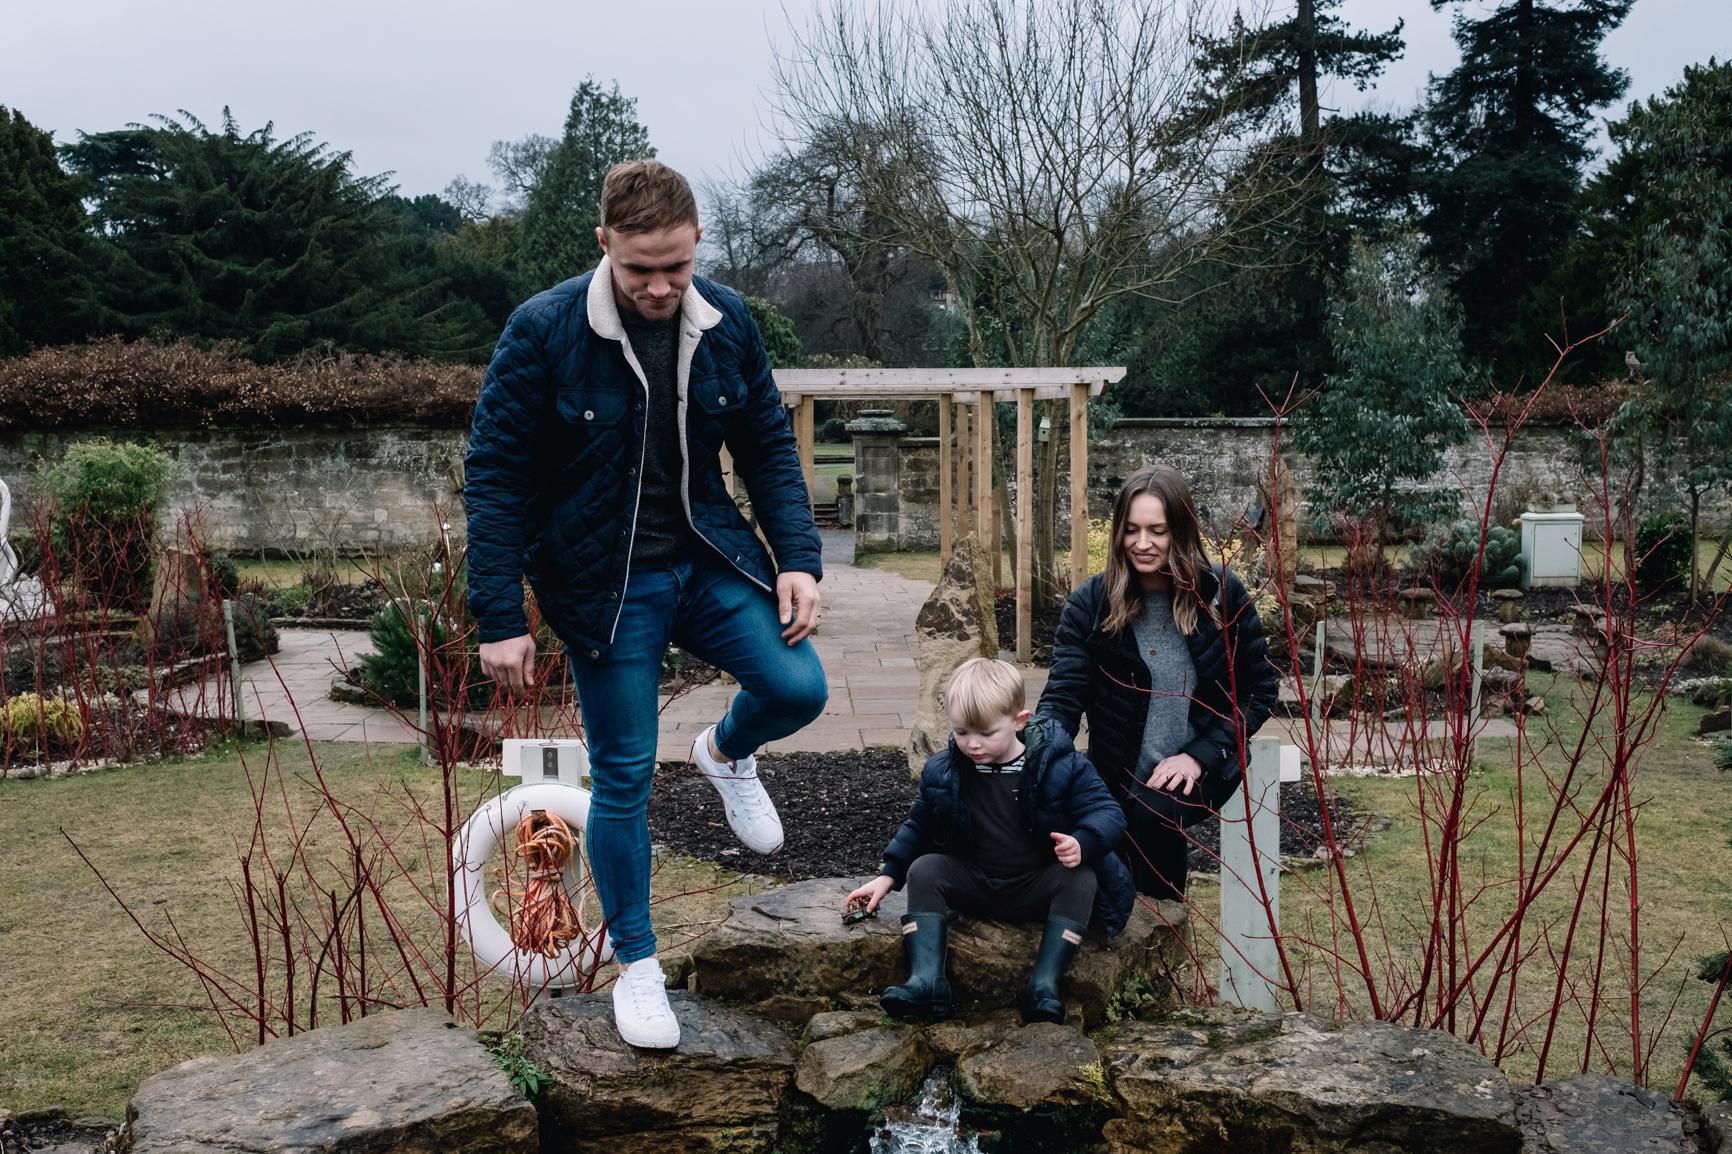 025-Scotland-Family-Photography-park.jpg